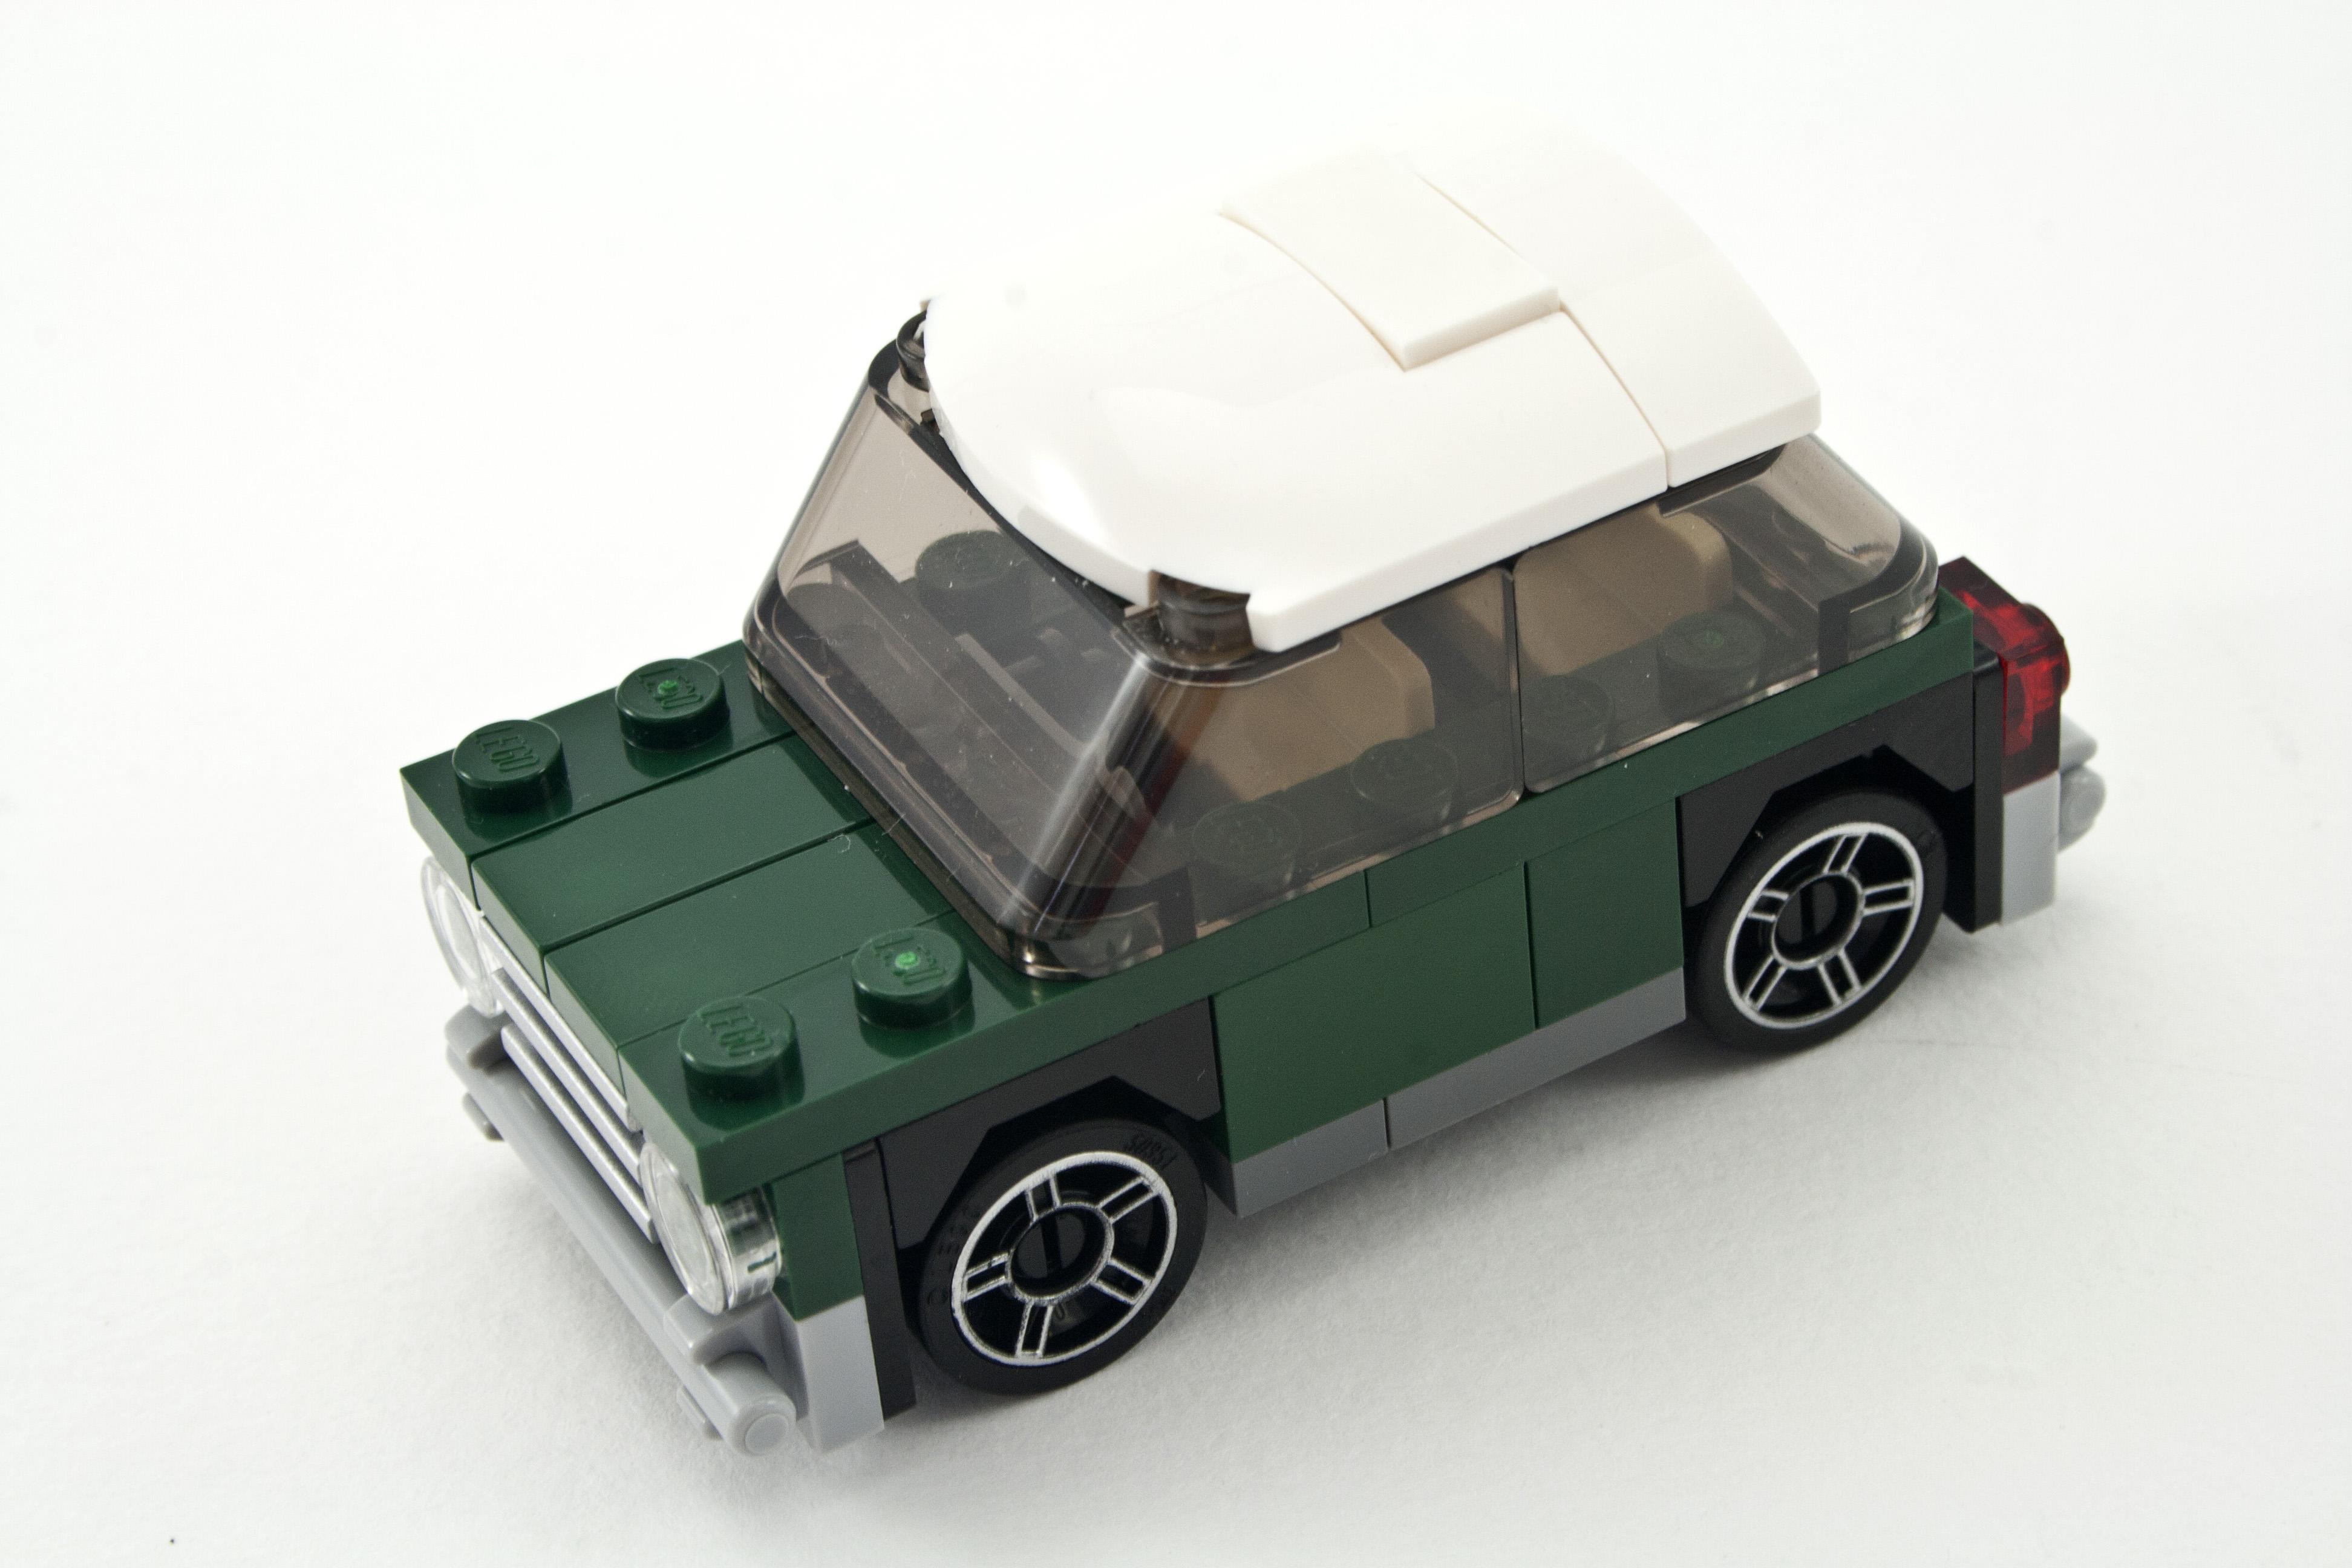 review 40109 mini mini cooper rebrickable build with. Black Bedroom Furniture Sets. Home Design Ideas